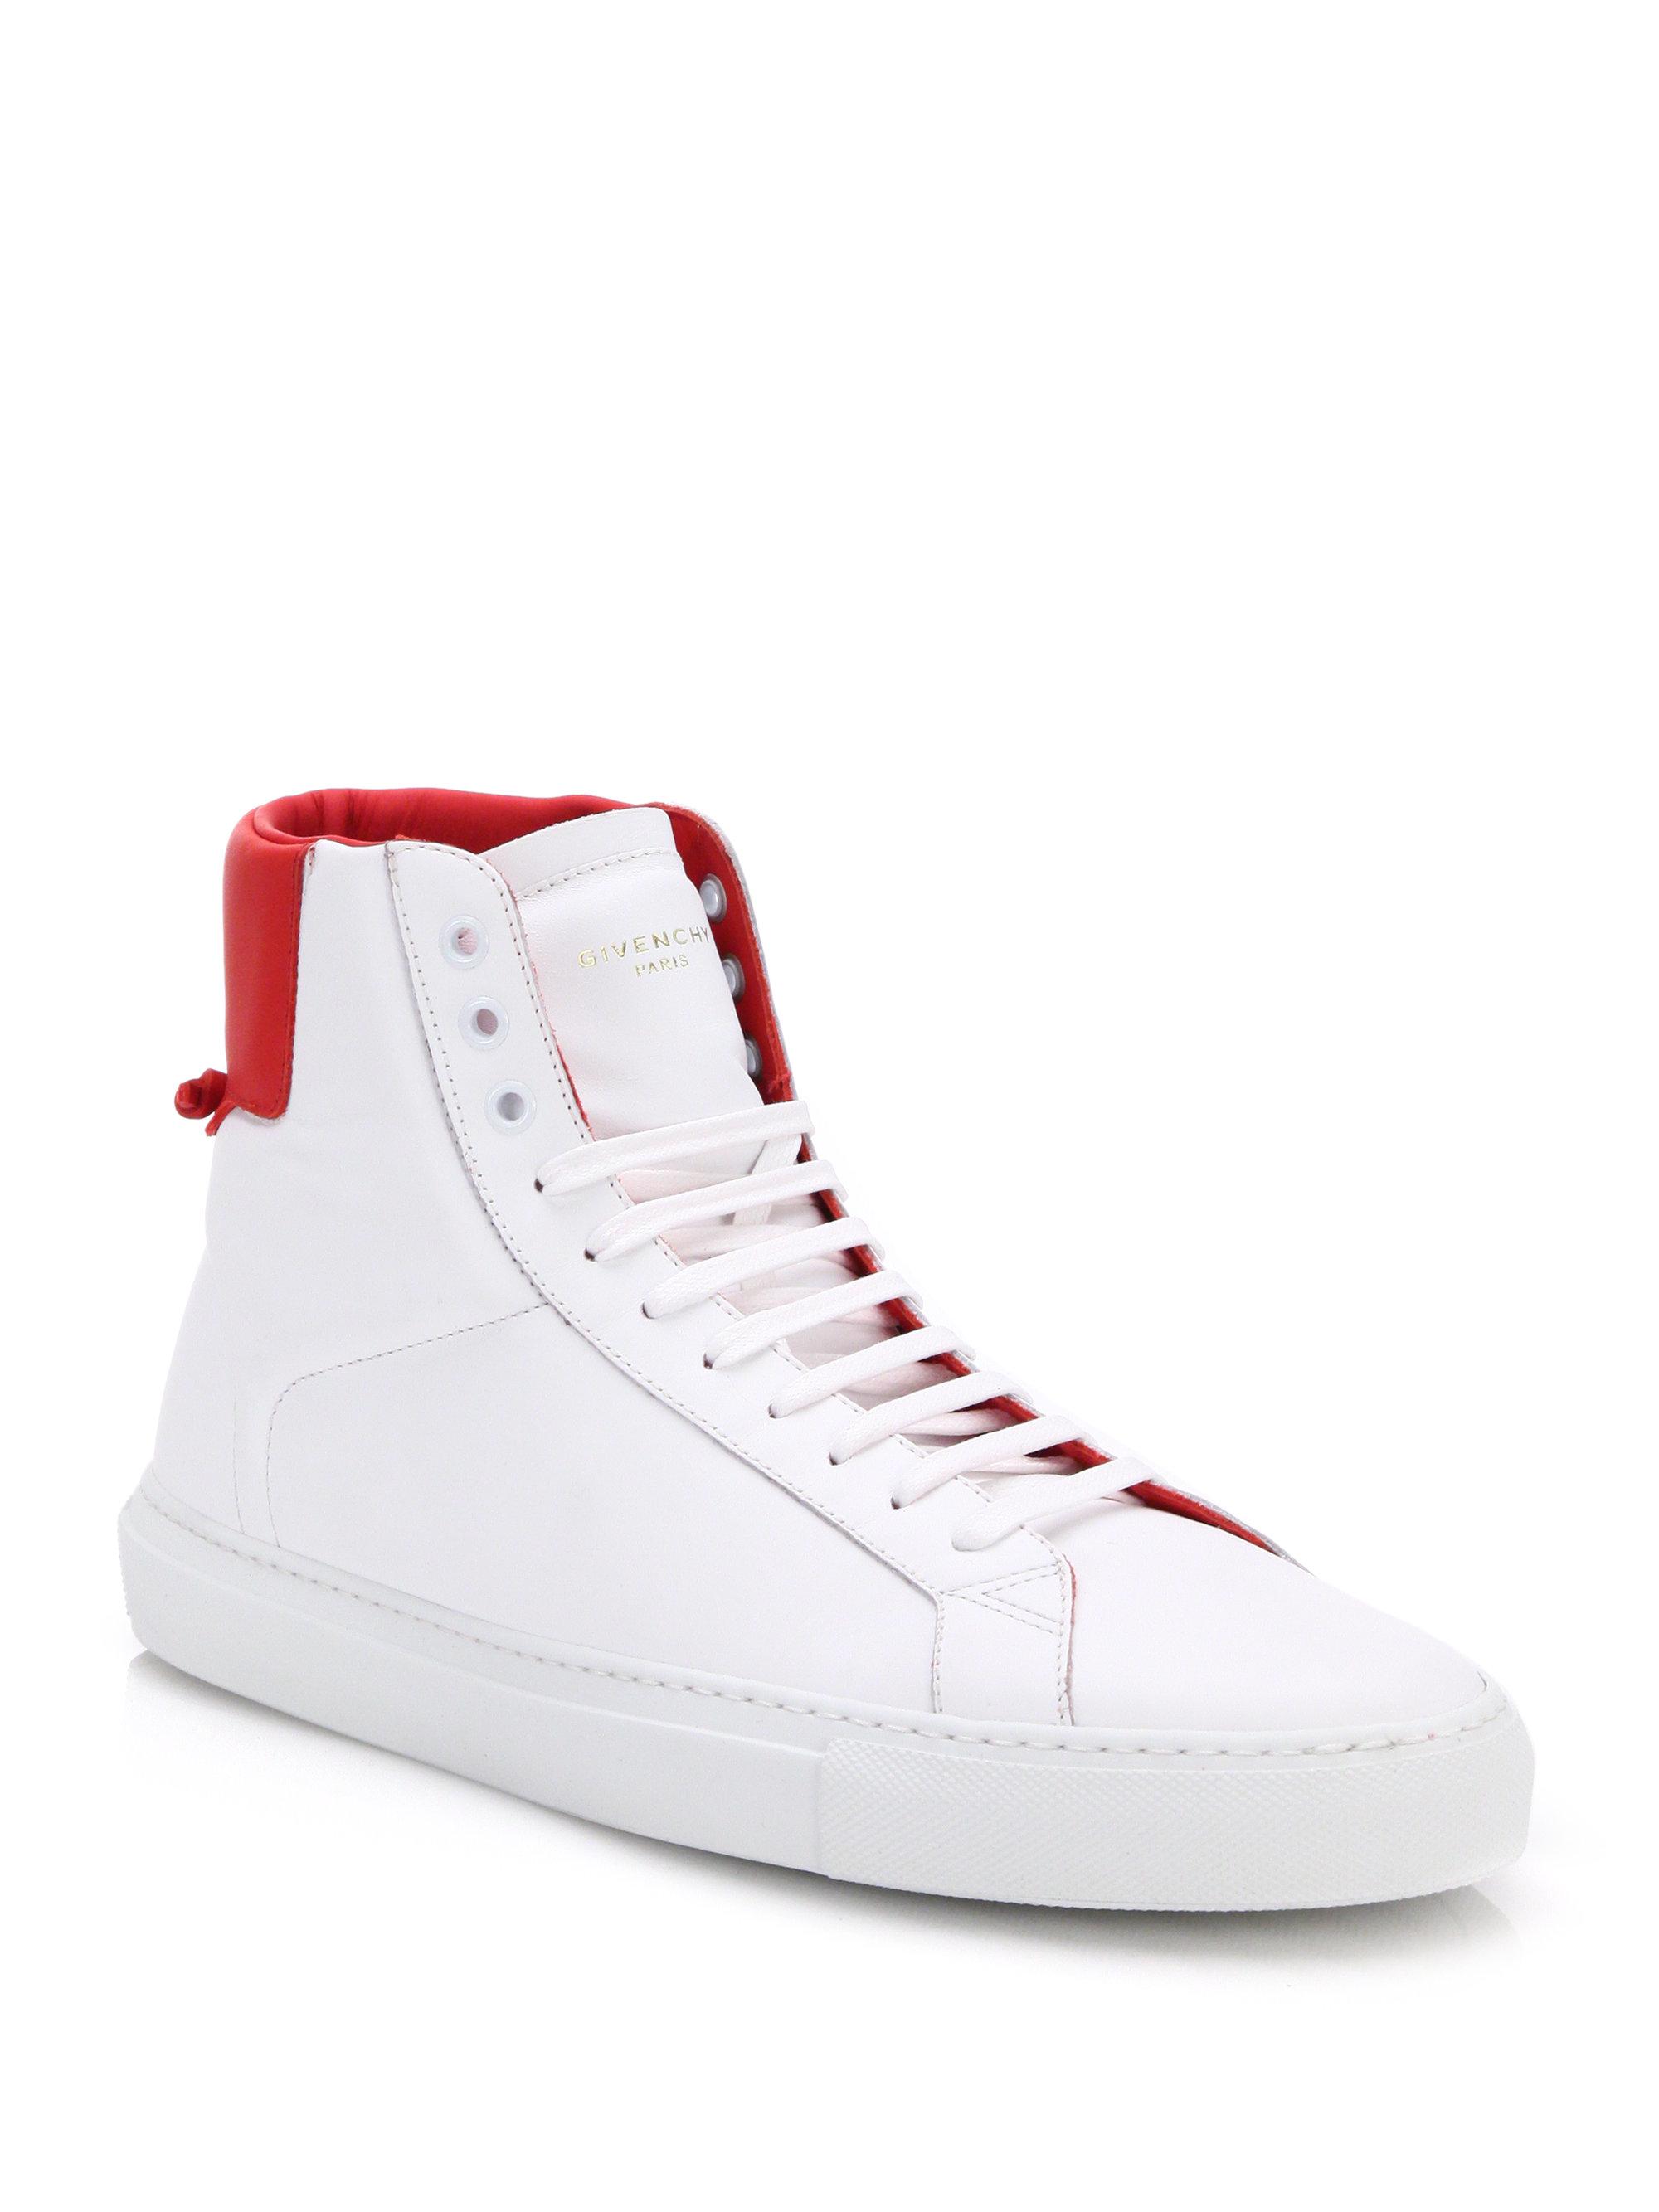 PARIS - Sneaker high - white dLwTxe4V